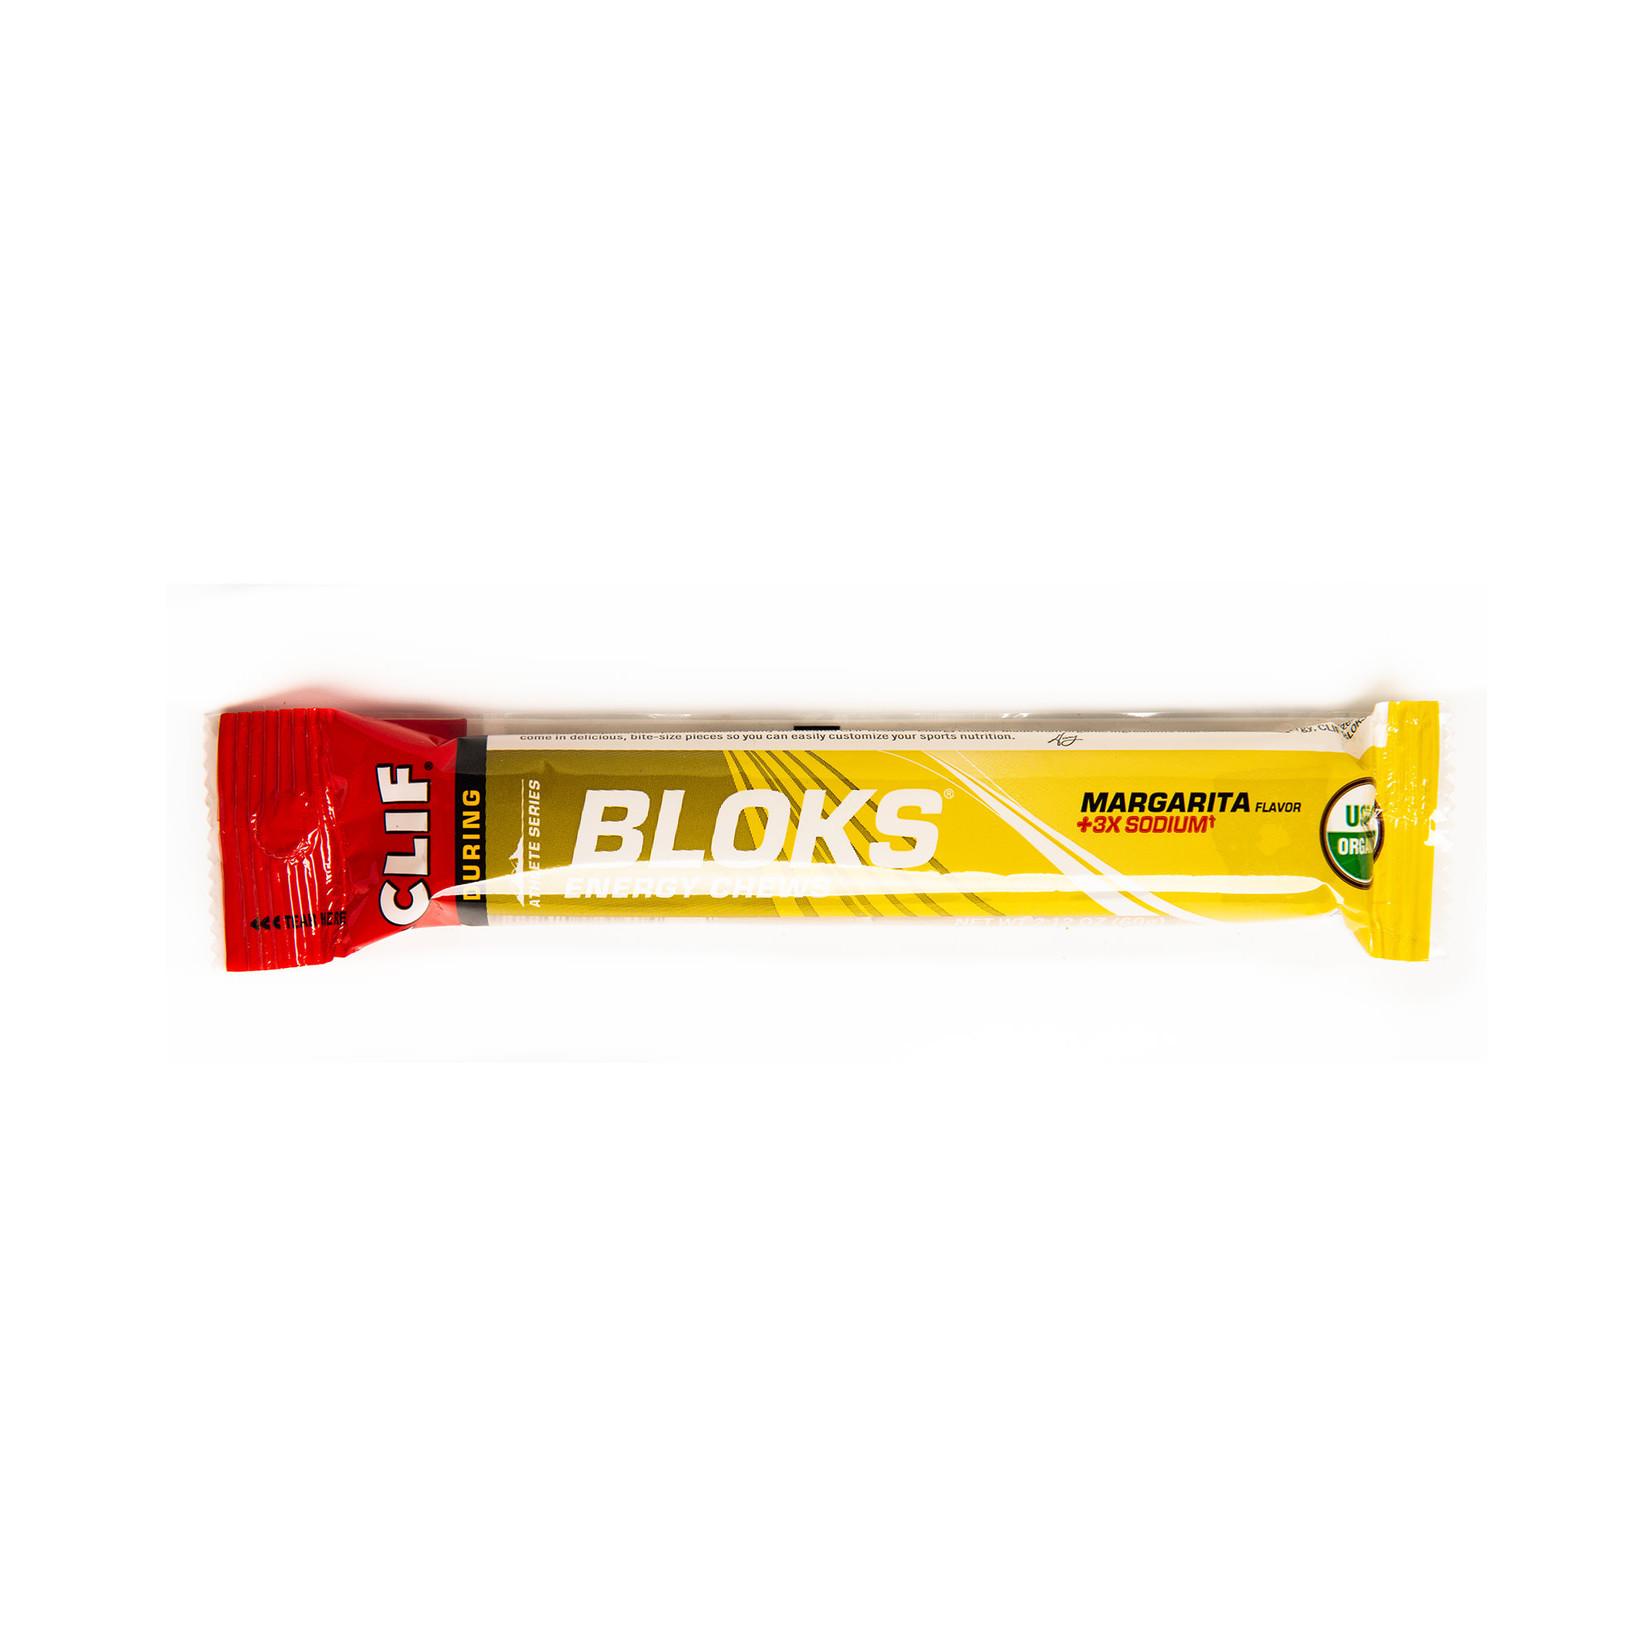 Clif Bar Clif Shot Bloks: Margarita with 3x Sodium; single